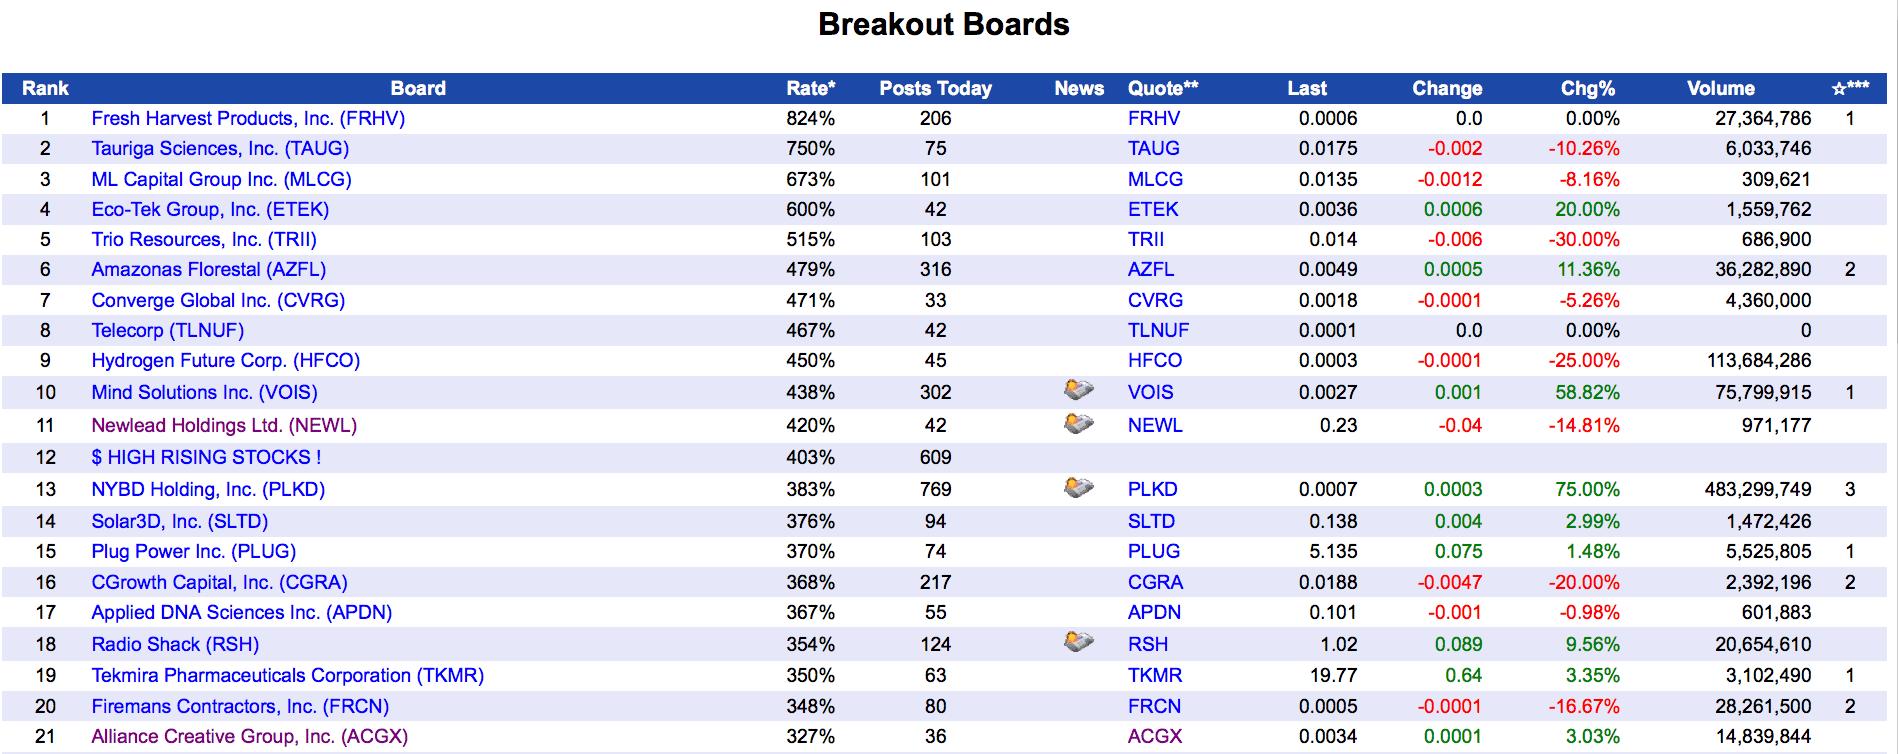 investorshub_breakoutboards